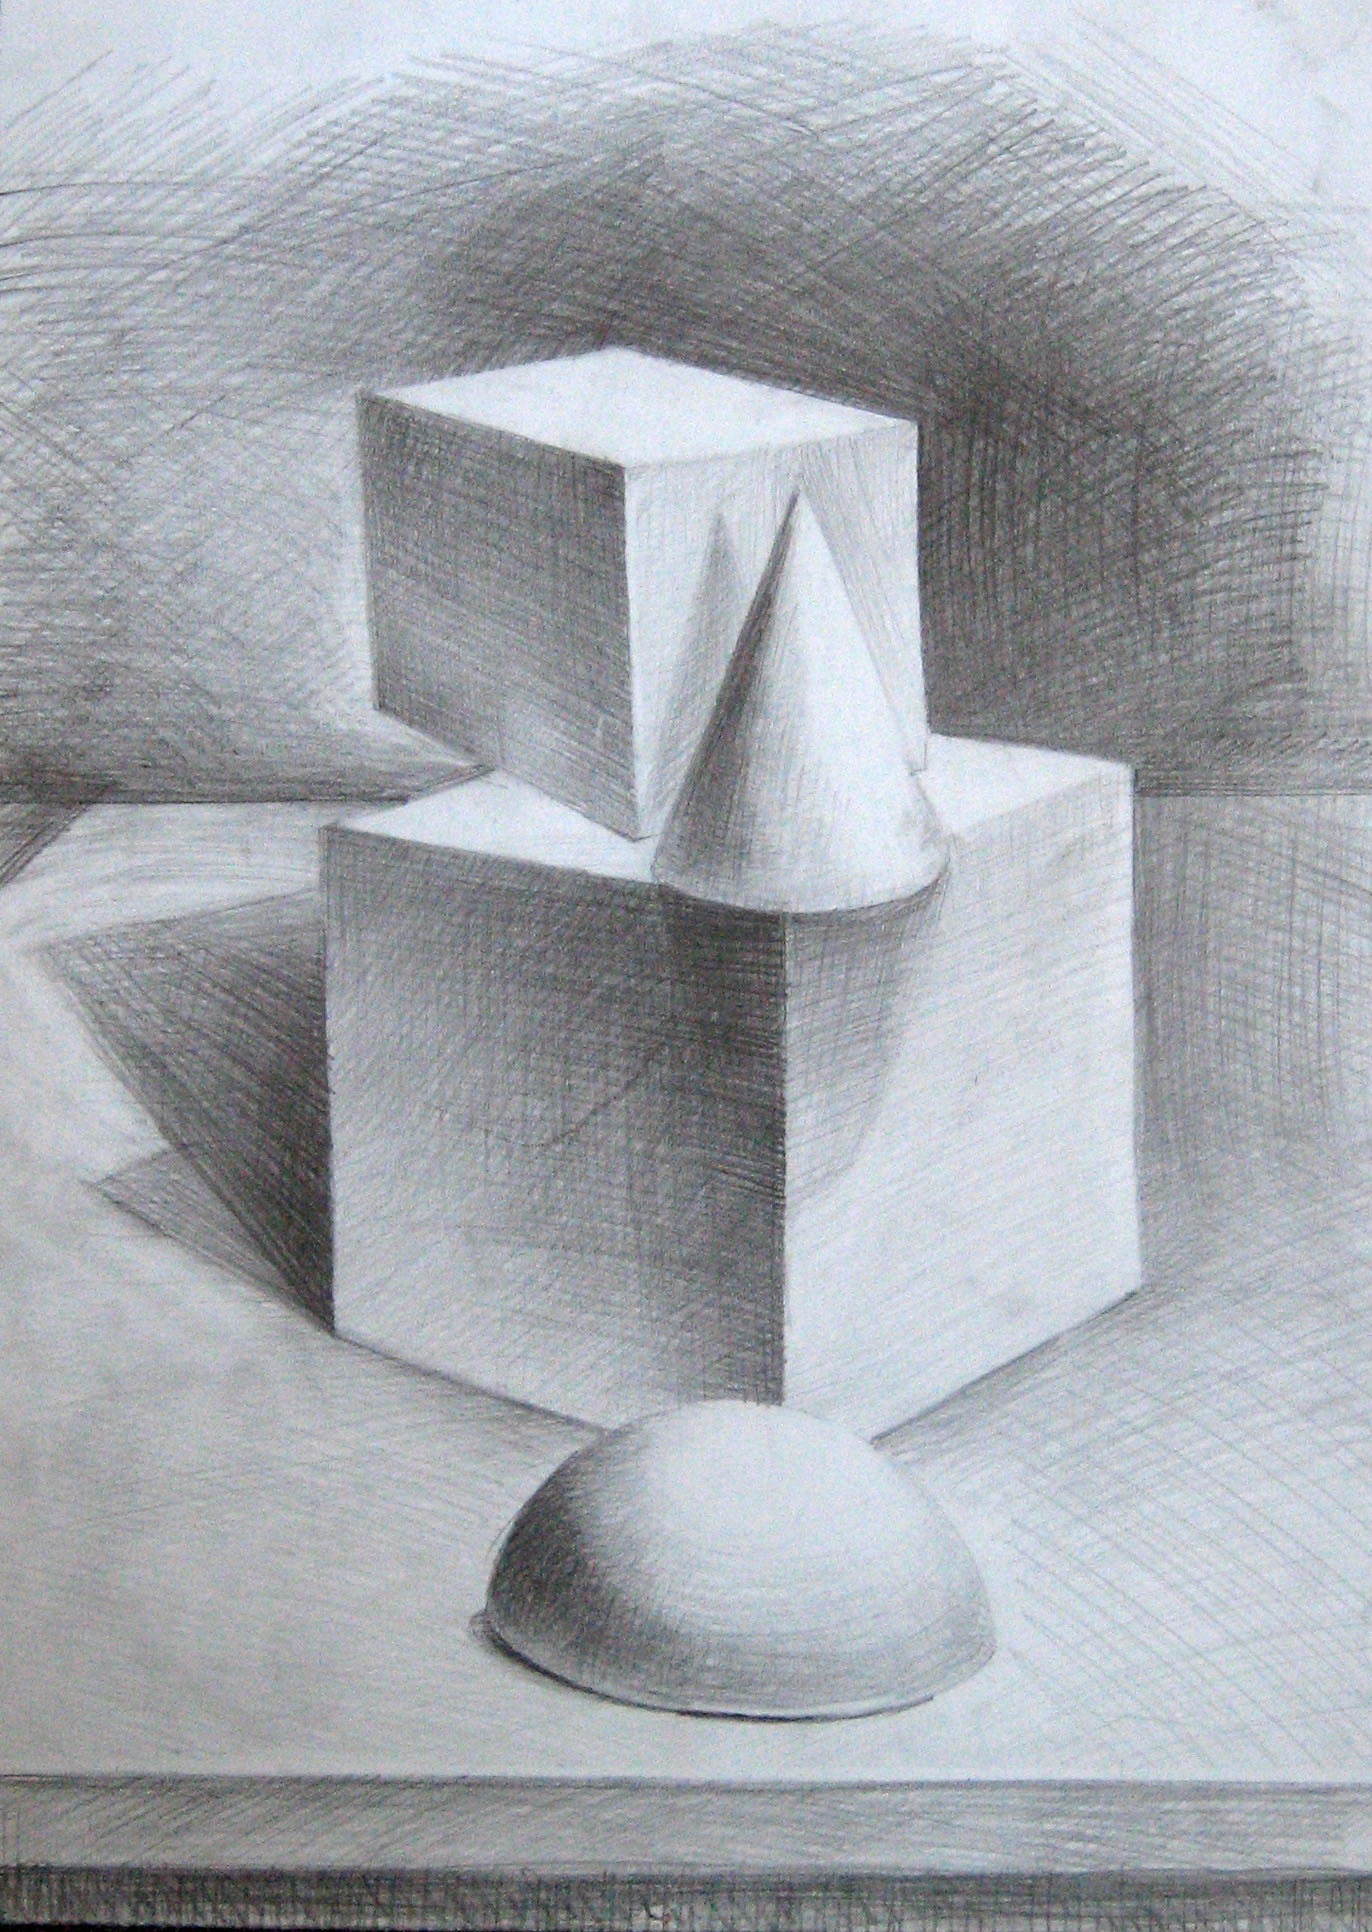 итоге картинка геометрических фигур карандашом что грузики вал